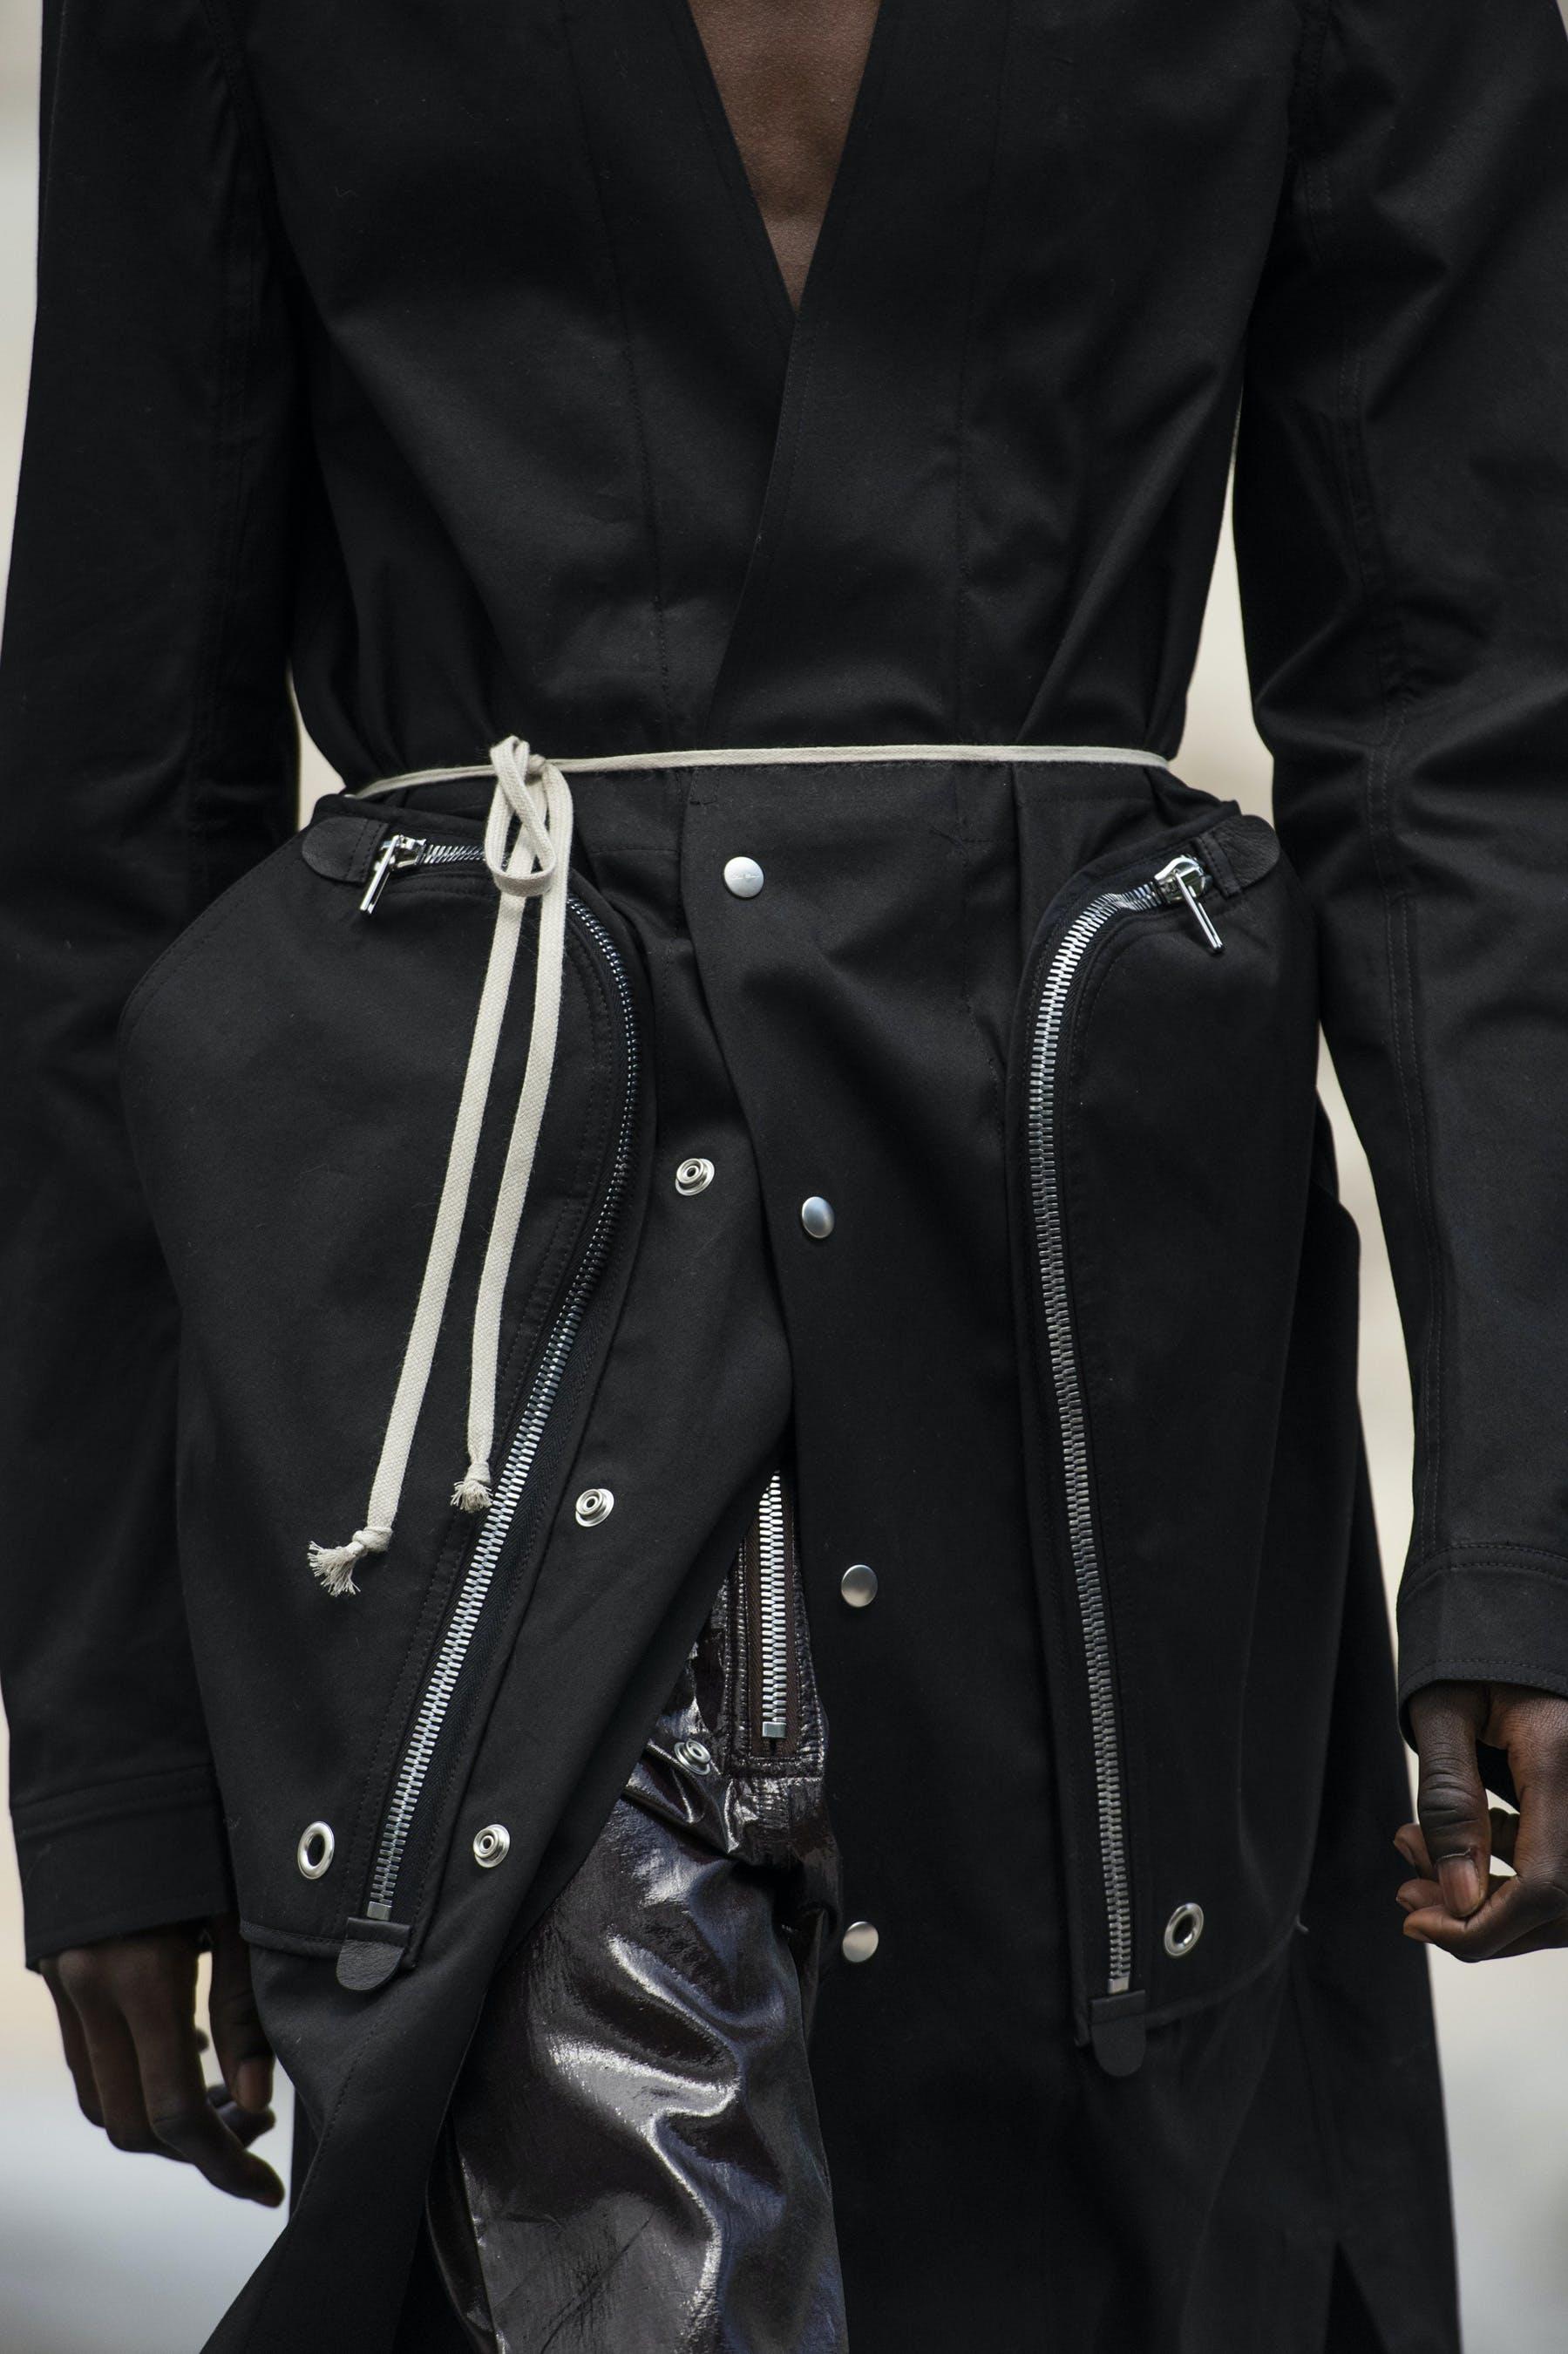 Rick Owens Runway Details Off the Runway Bauhaus Duster In Black Cotton Bauhaus Cargo Pants In Black Lamb Leather Mens SS20 Tecautl